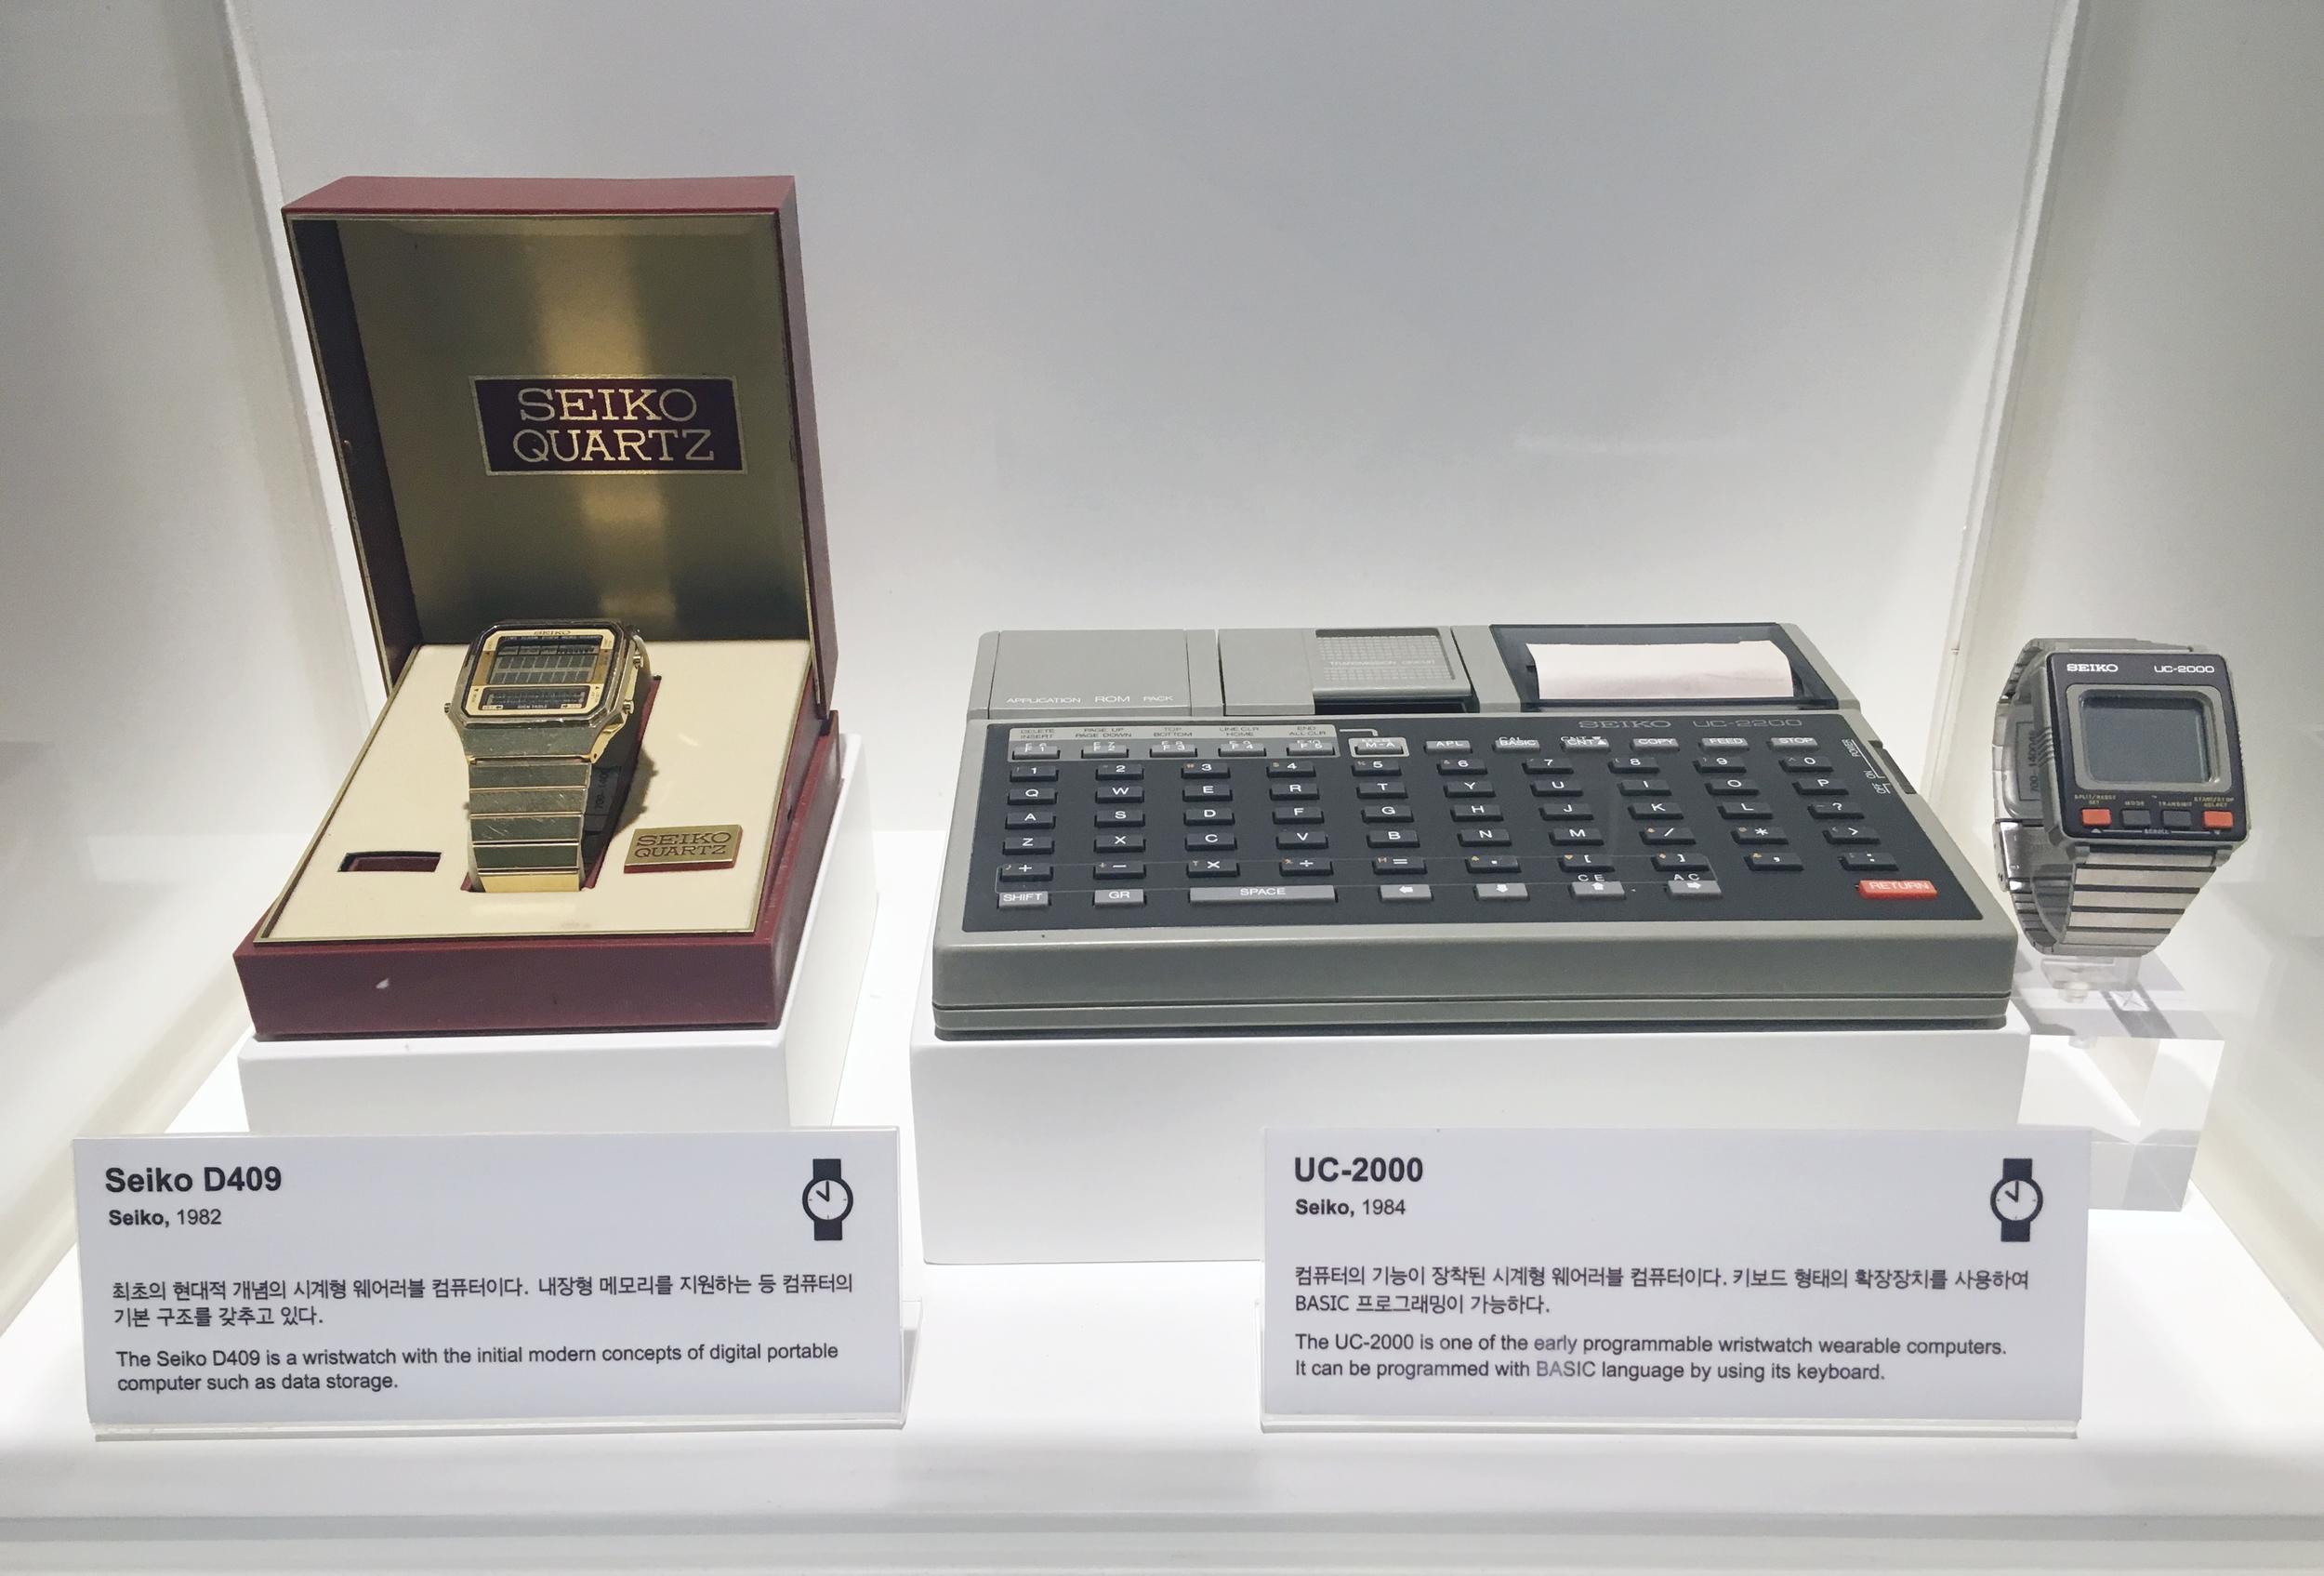 Seiko Smartwatch